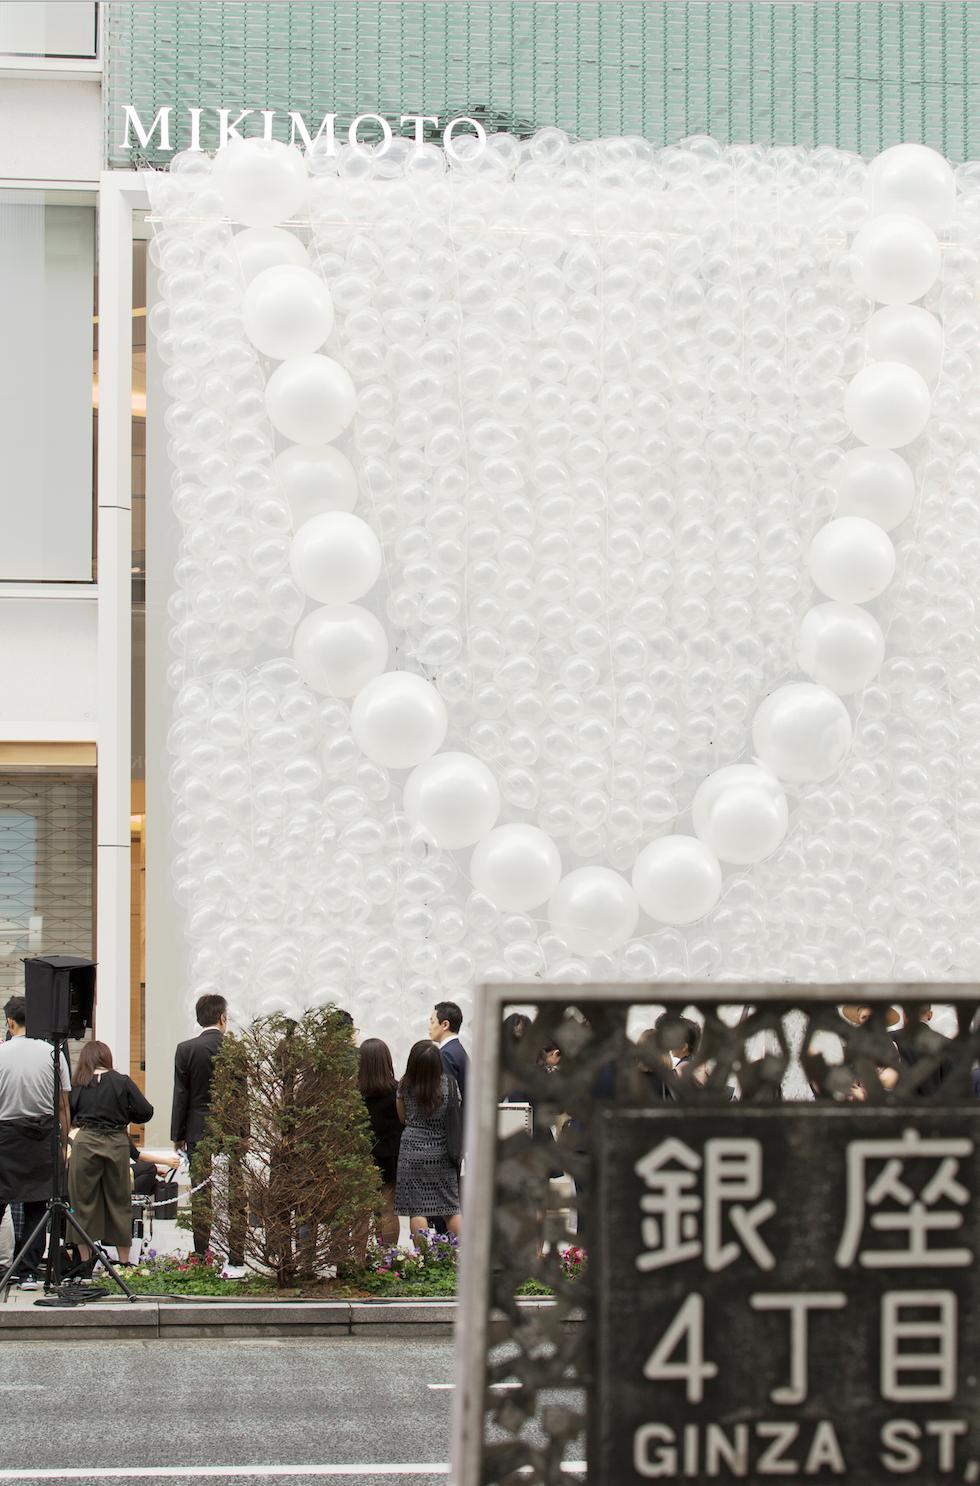 MIKIMOTO銀座四丁目總店開幕剪綵活動,於外牆裝飾象徵海水泡沫的真珠白氣球,並排列成一串珍珠項鍊